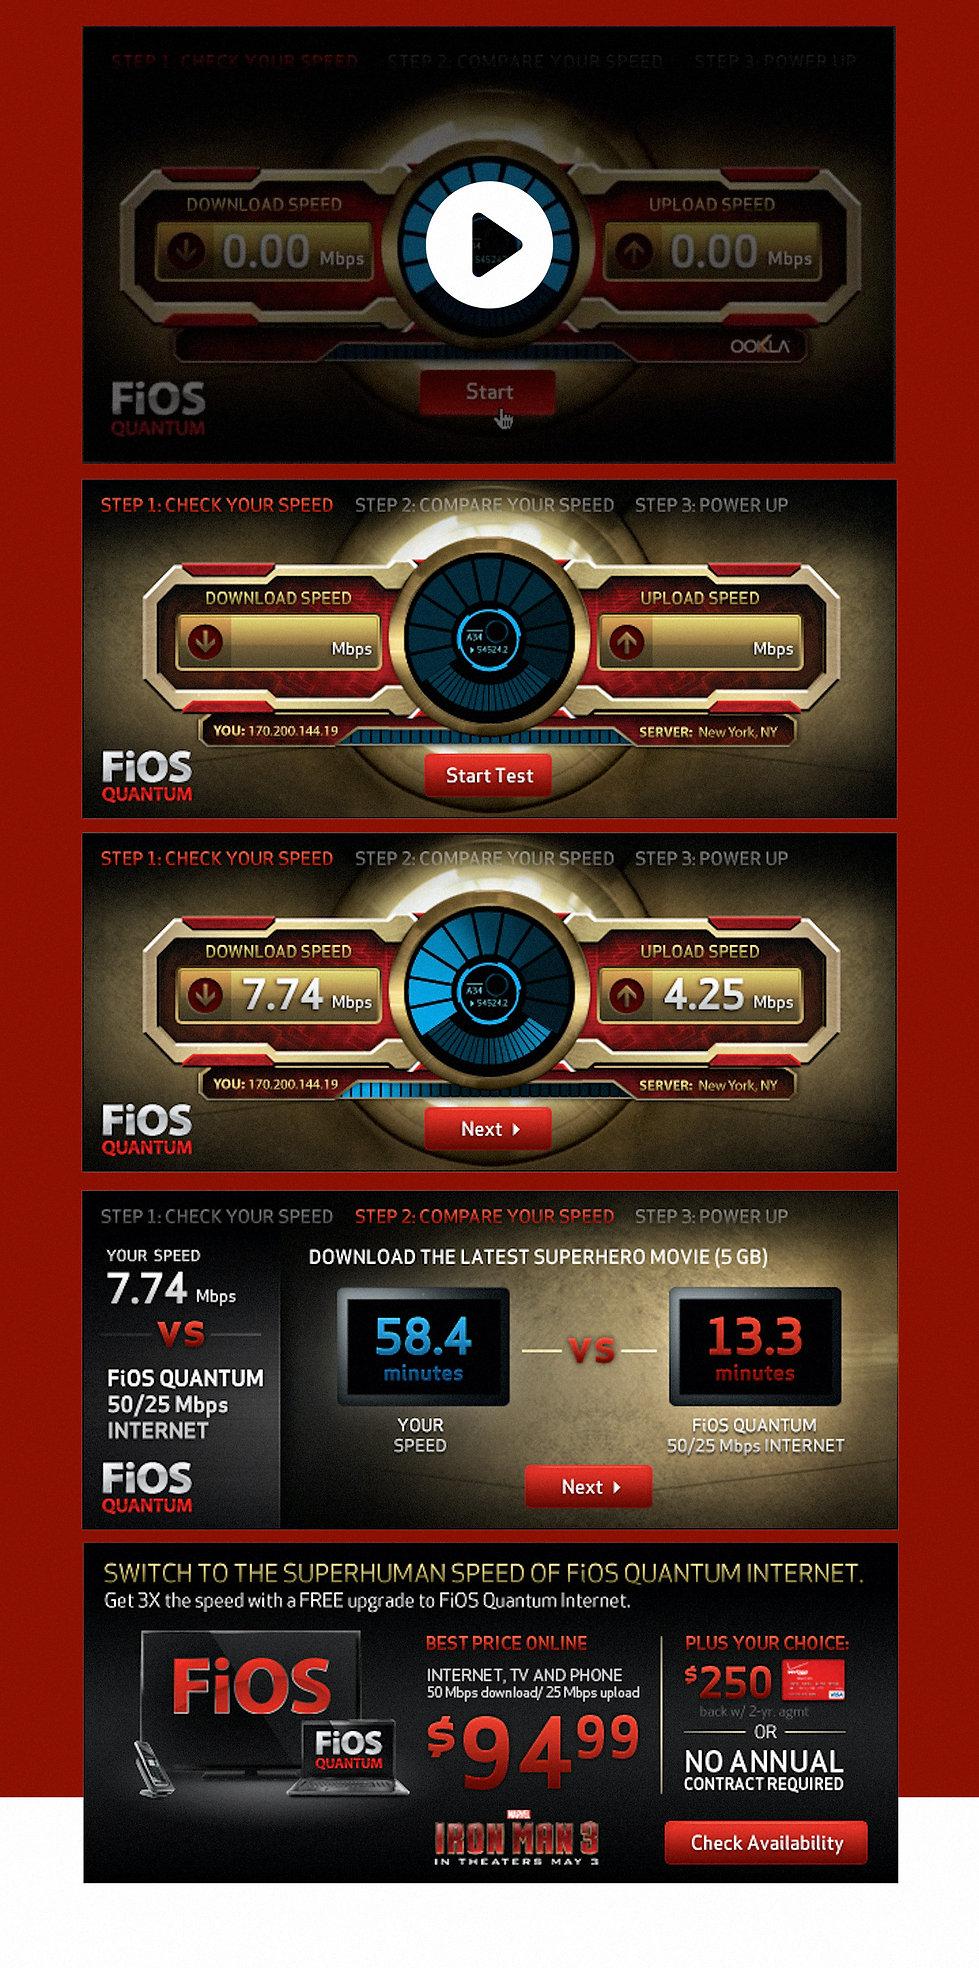 Verizon_Iron_Man_Campaign_113019_Web_10.